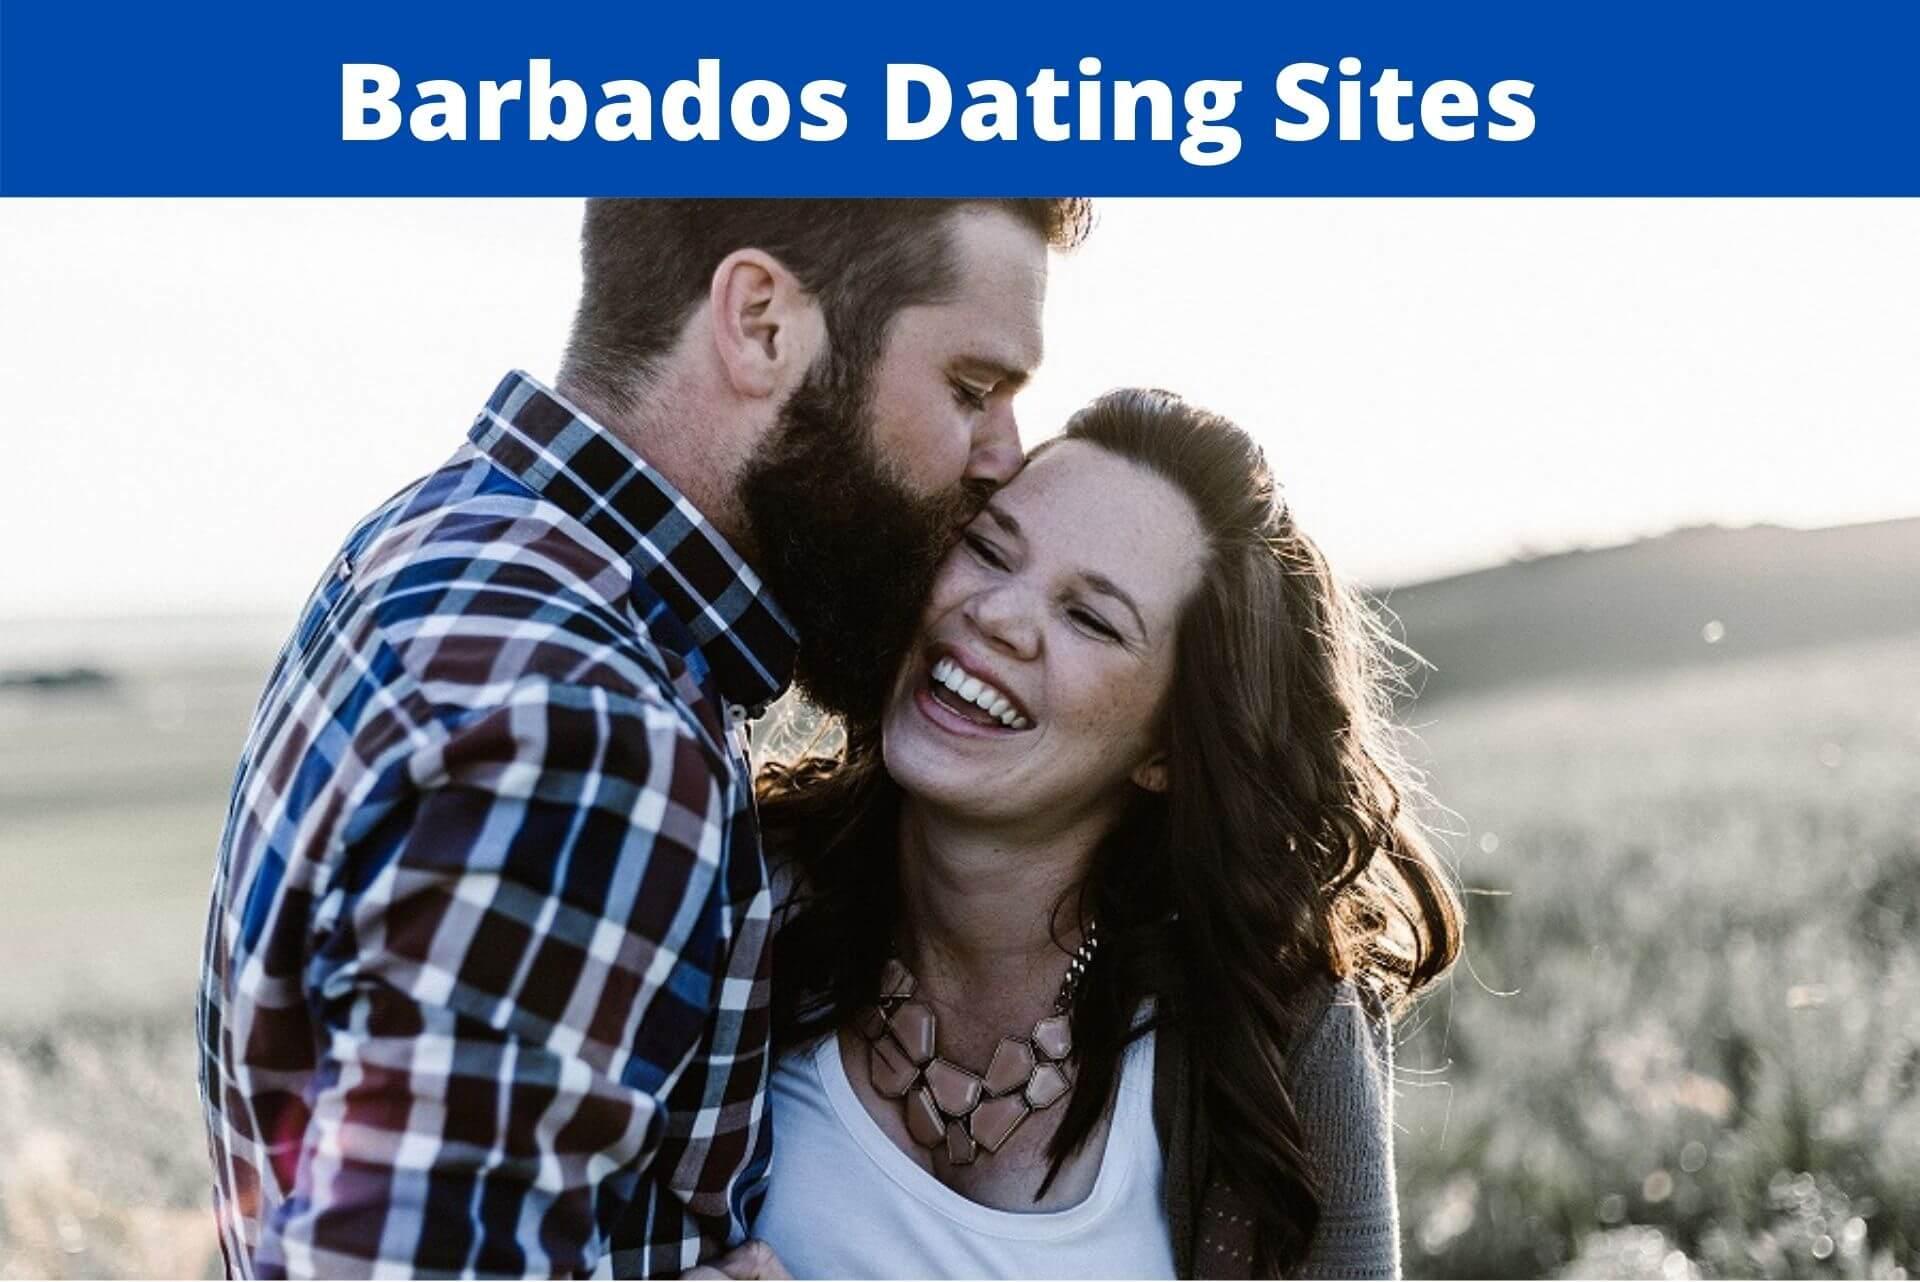 Barbados Dating Sites